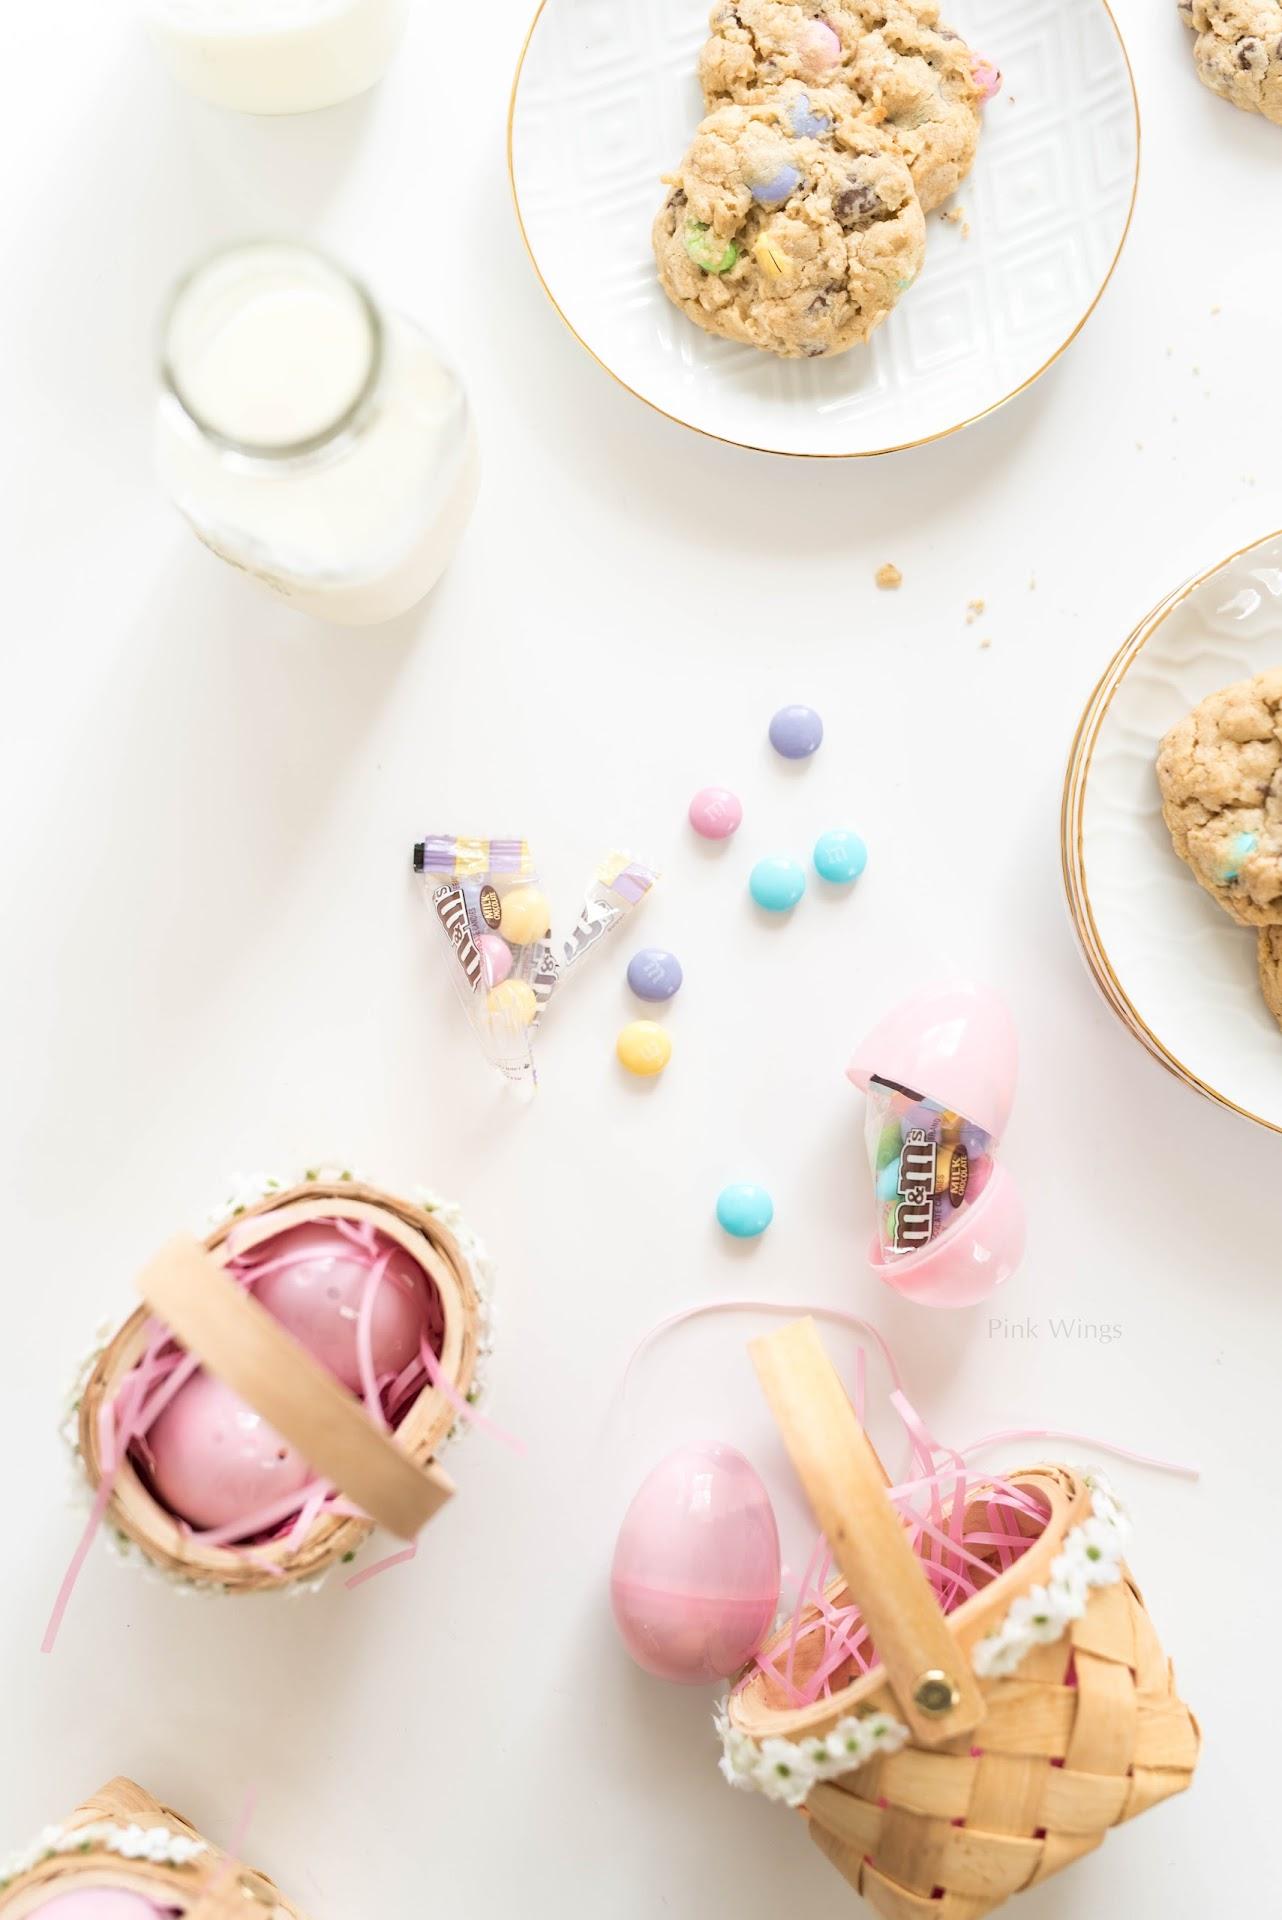 homemade easter basket treats, easter dessert recipe, easter cookie recipe, pastel dessert, hawaiian cookie recipe easy, hawaiian dessert recipe, hawaiian cookie recipe, hawaiian chocolate chip cookies, unique cookie recipes, creative cookies, cookie exchange ideas